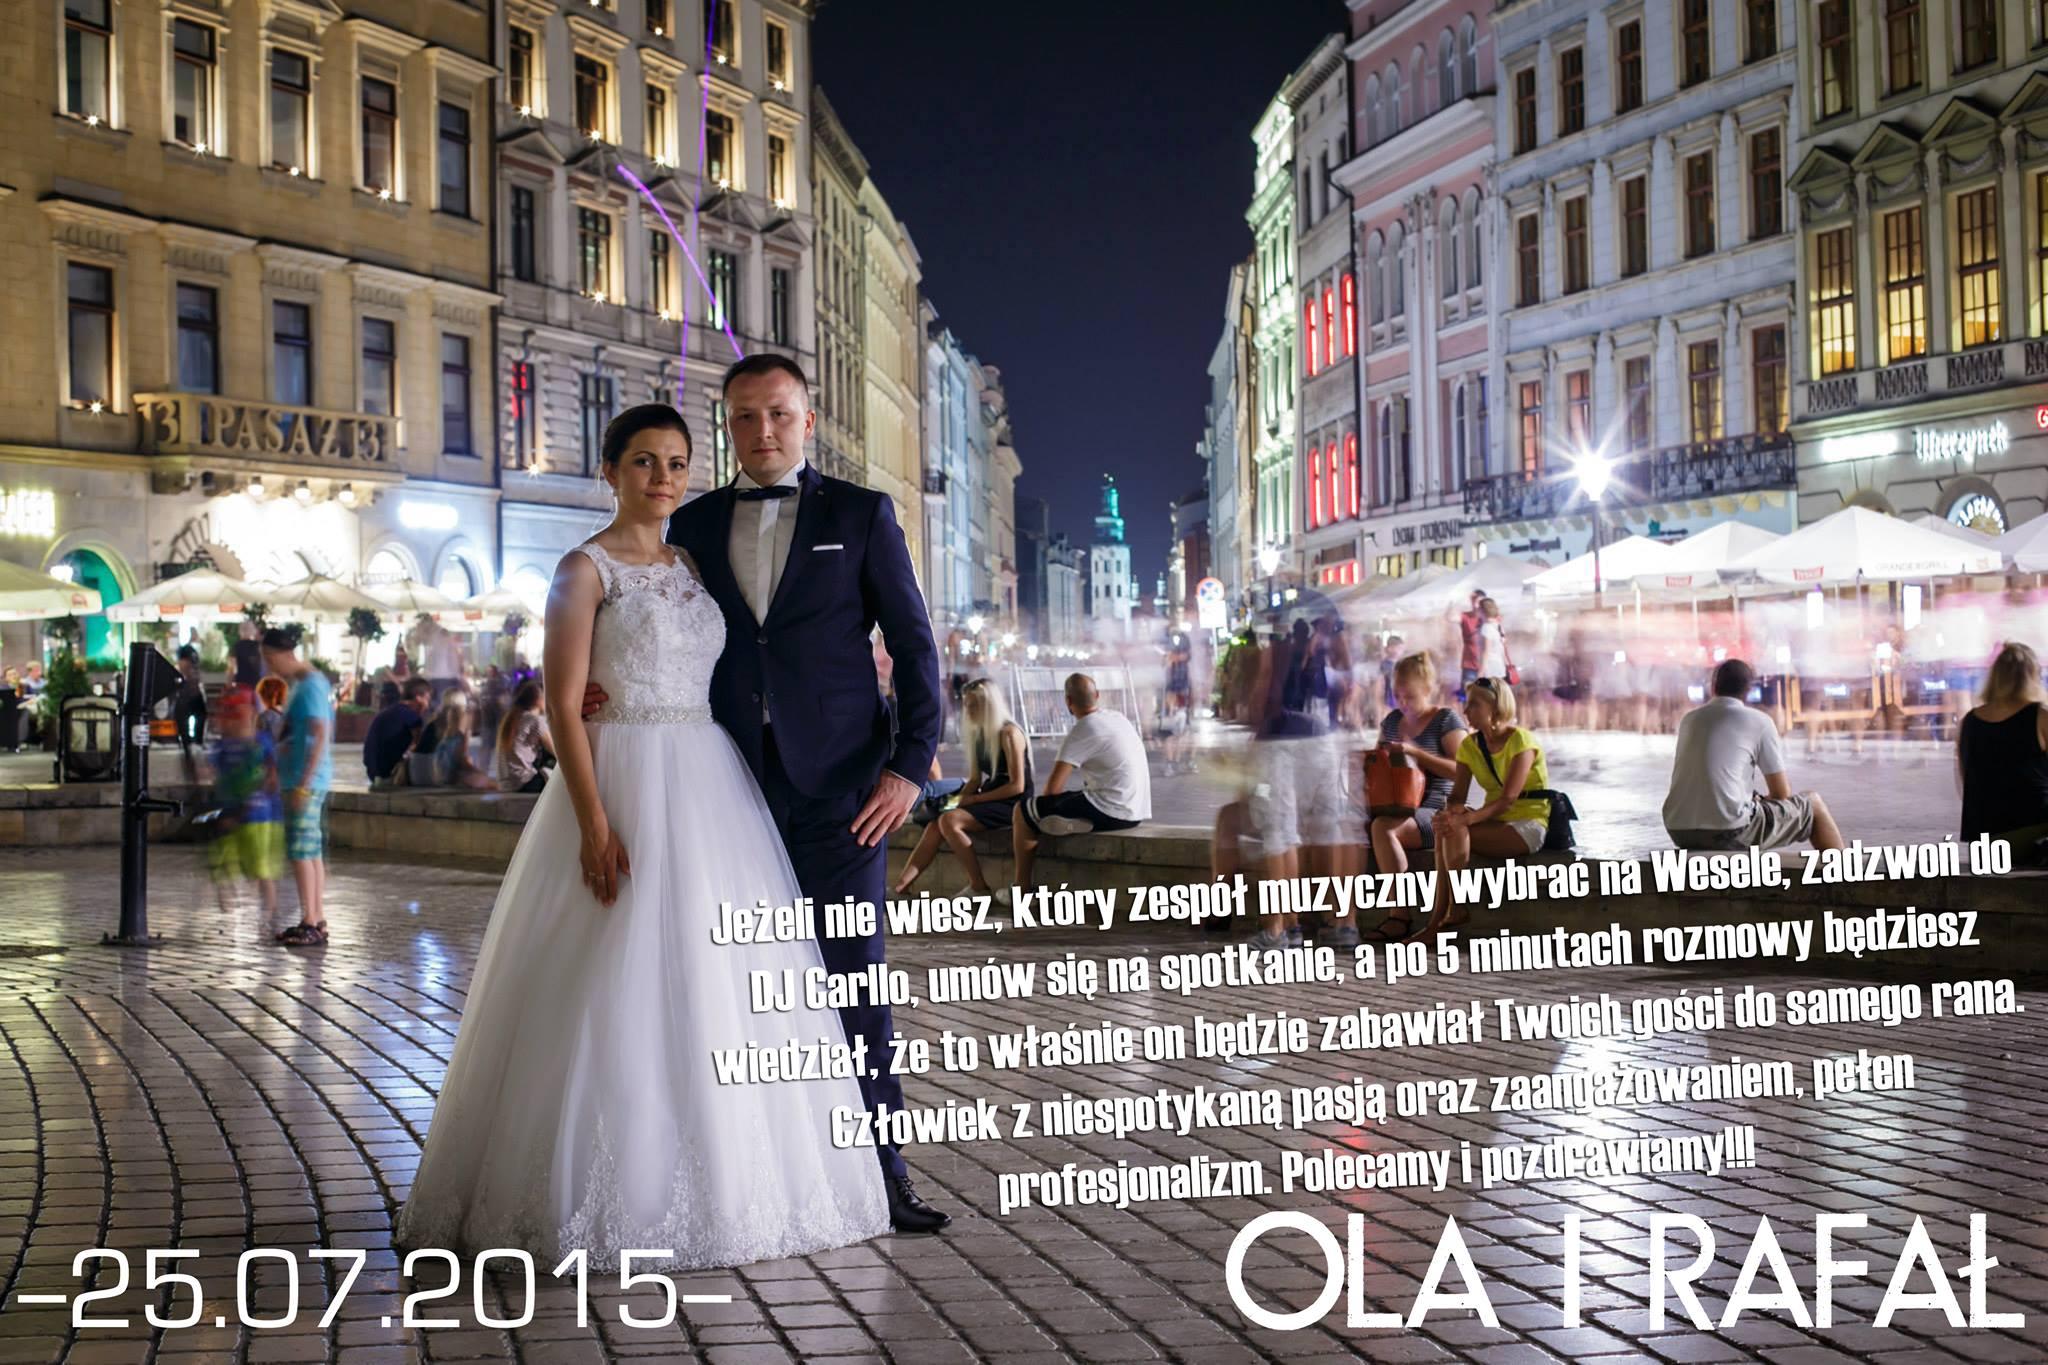 OLA & RAFAŁ